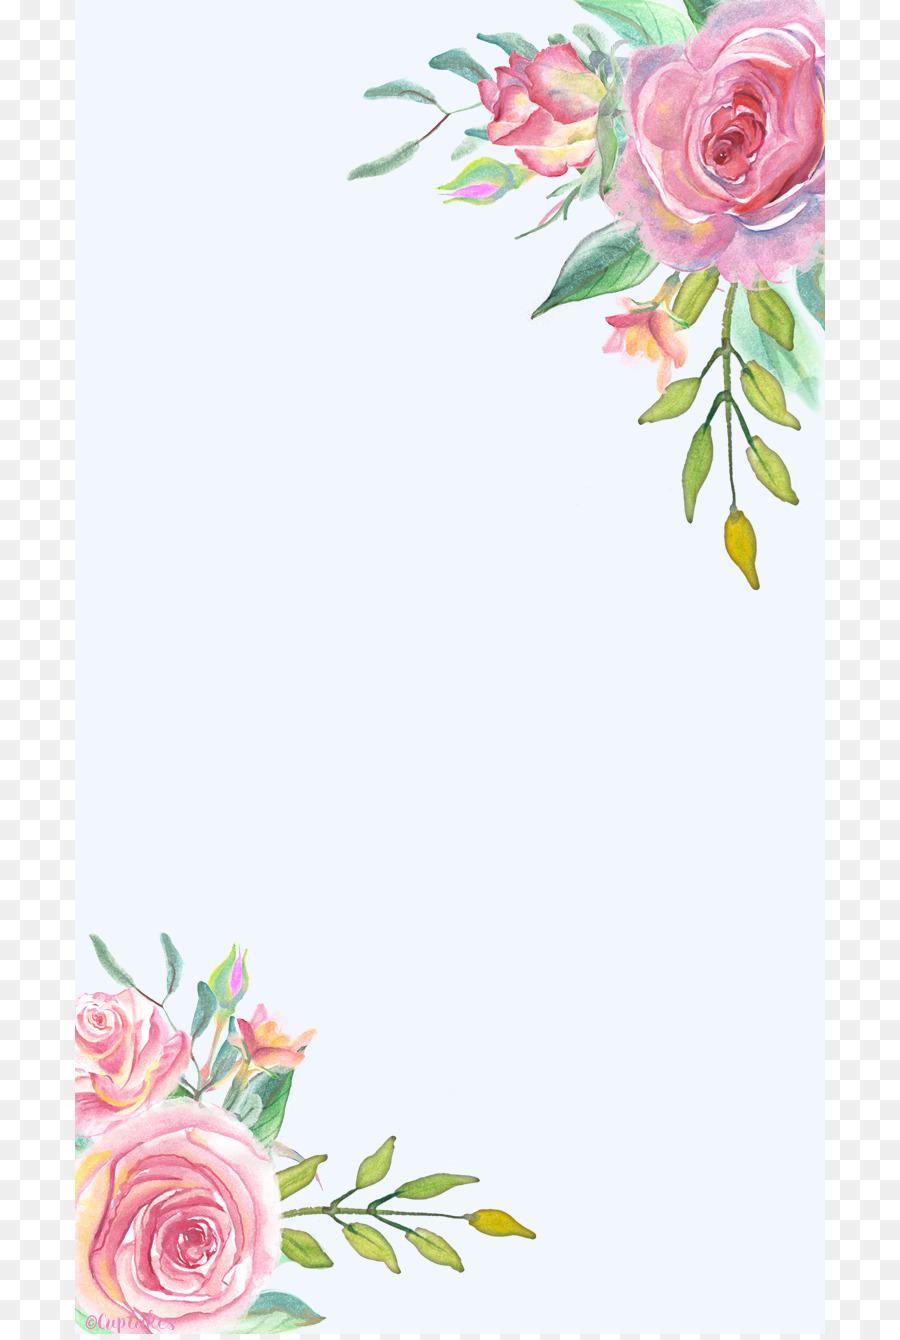 Desktop Wallpaper Flower Floral Design Home Screen Watercolor